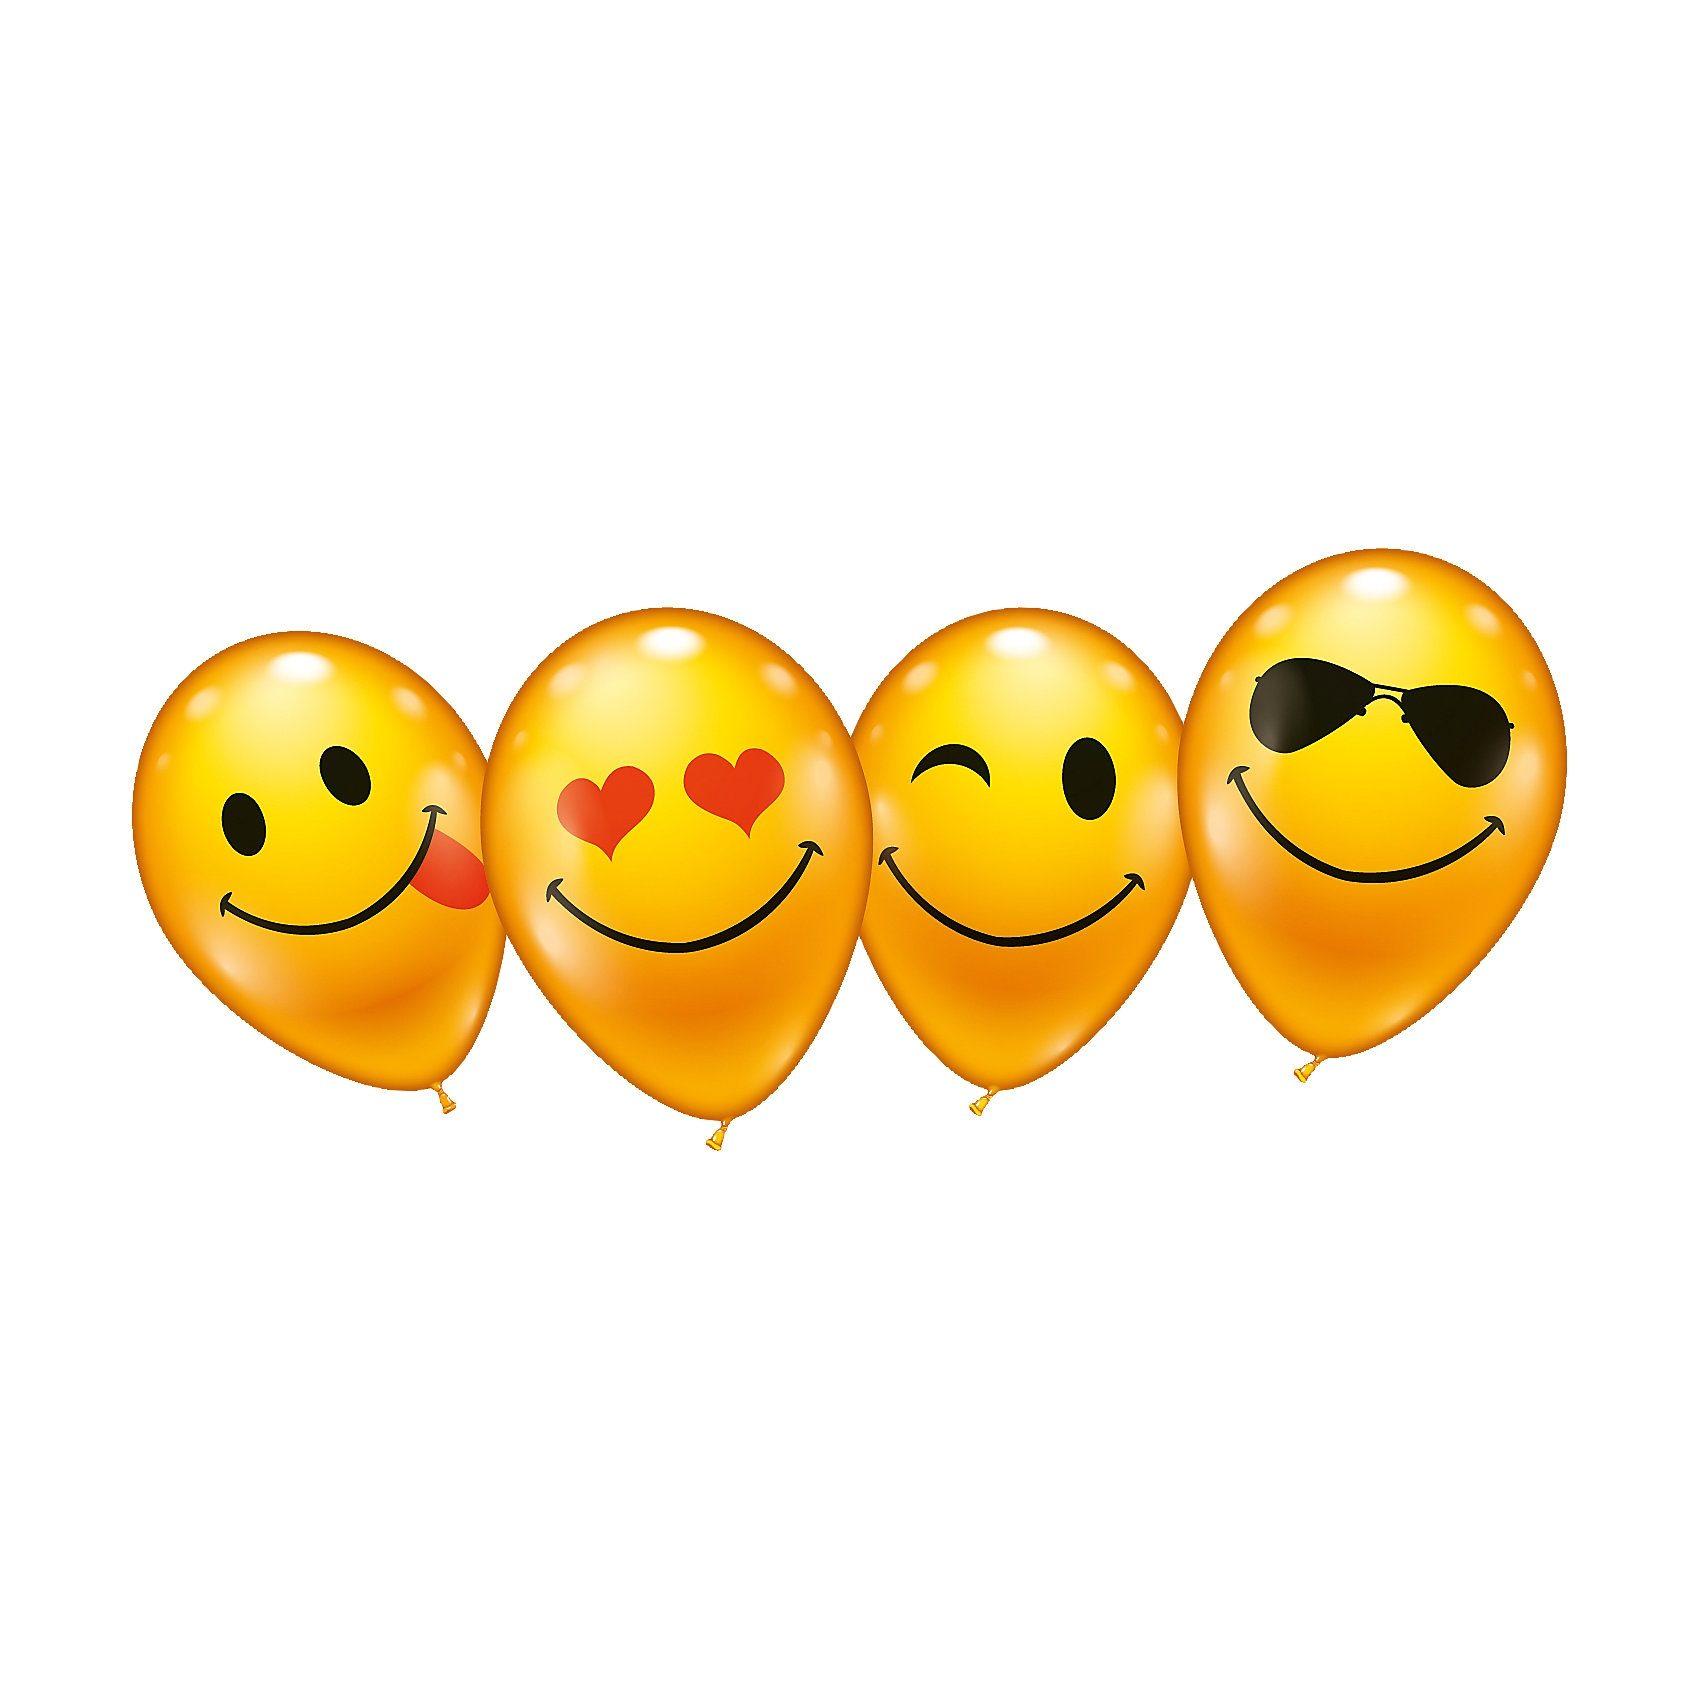 Karaloon Luftballons What´s Smile, 8 Stück